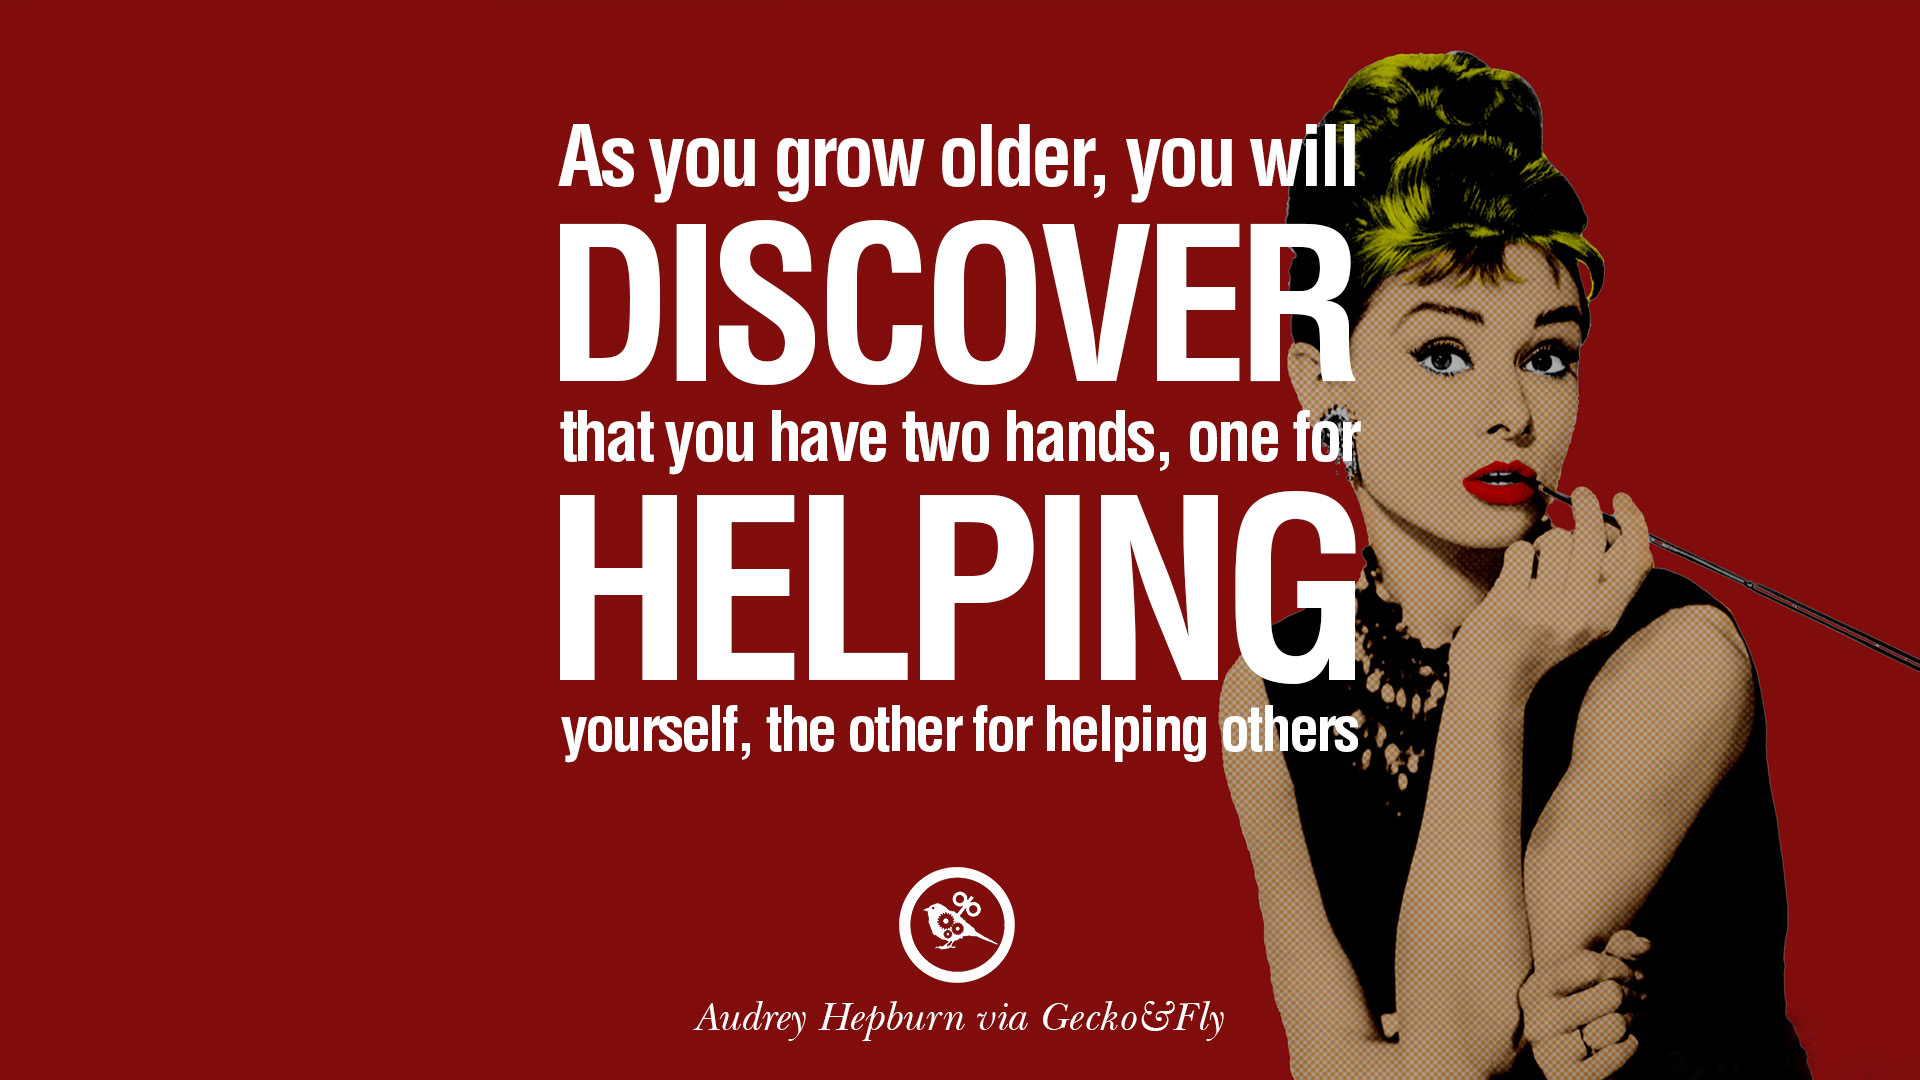 10 Fashionable Audrey Hepburn Quotes On Life, Fashion -6704